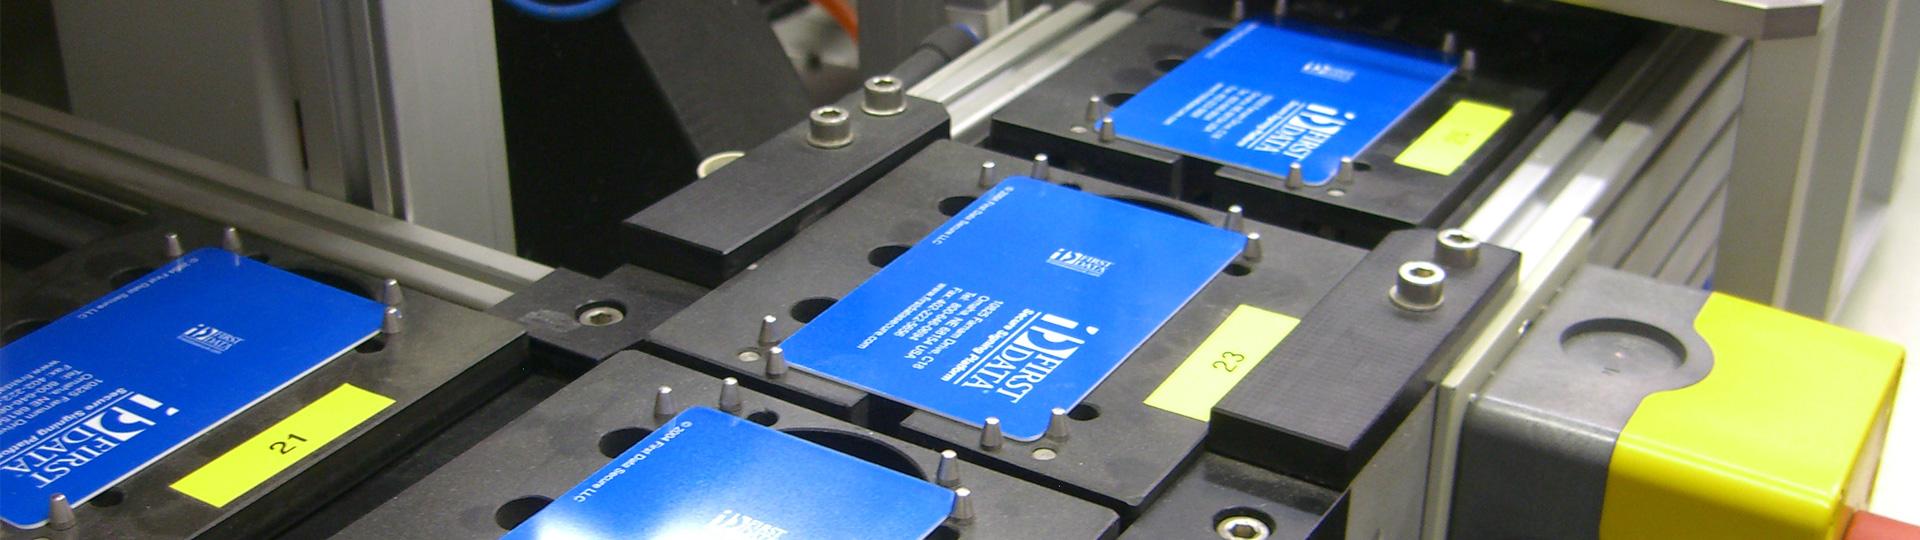 Smart card manufacturing